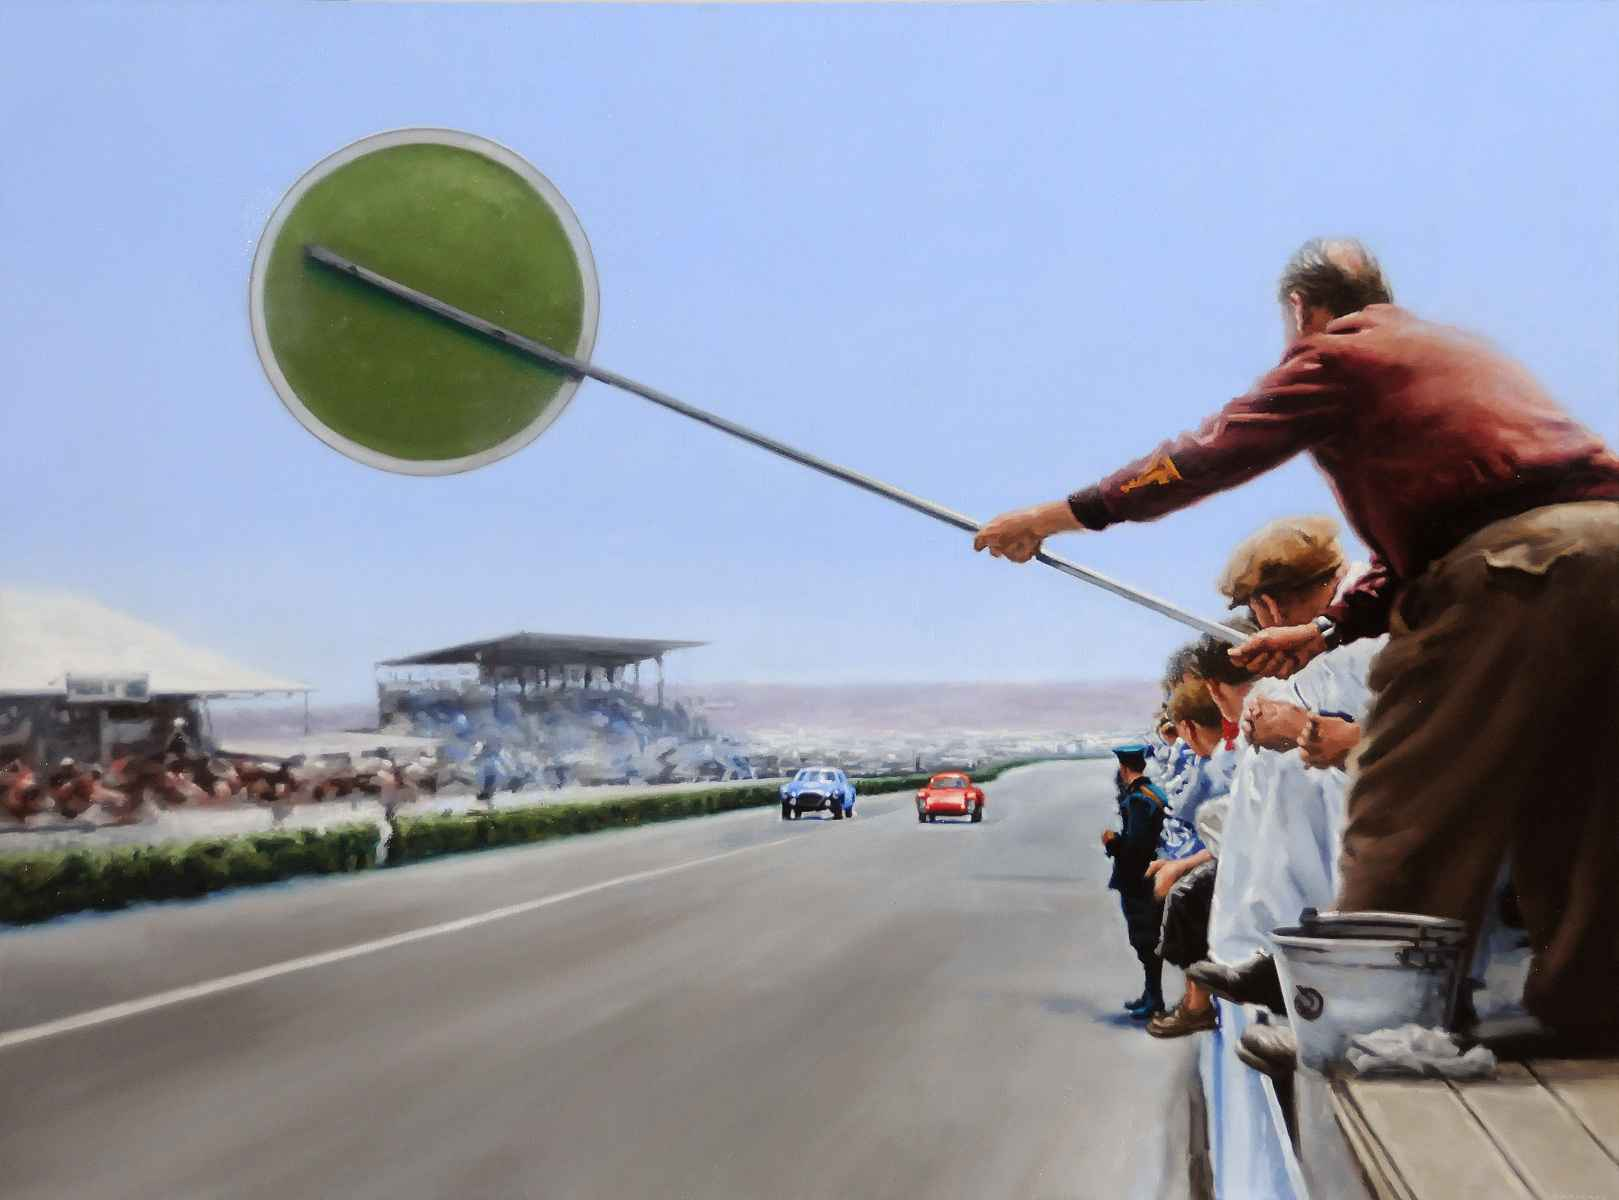 Bound To Cross the Li... by Mr. Zachary Proctor - Masterpiece Online